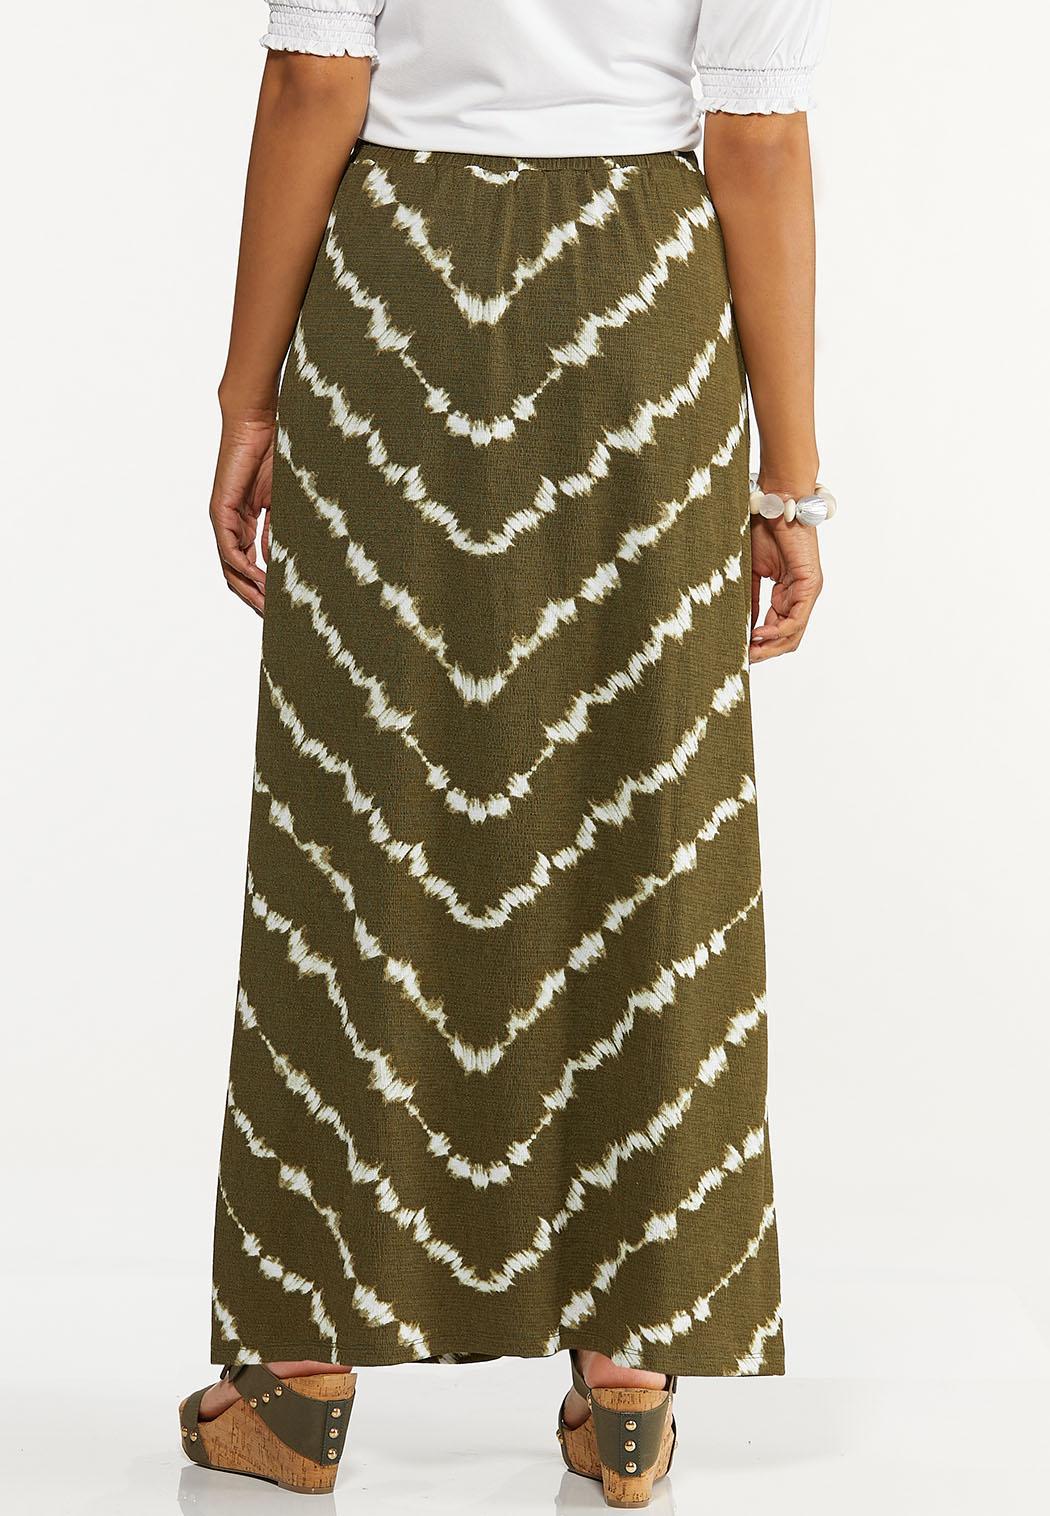 Olive Tie Dye Maxi Skirt (Item #44605830)